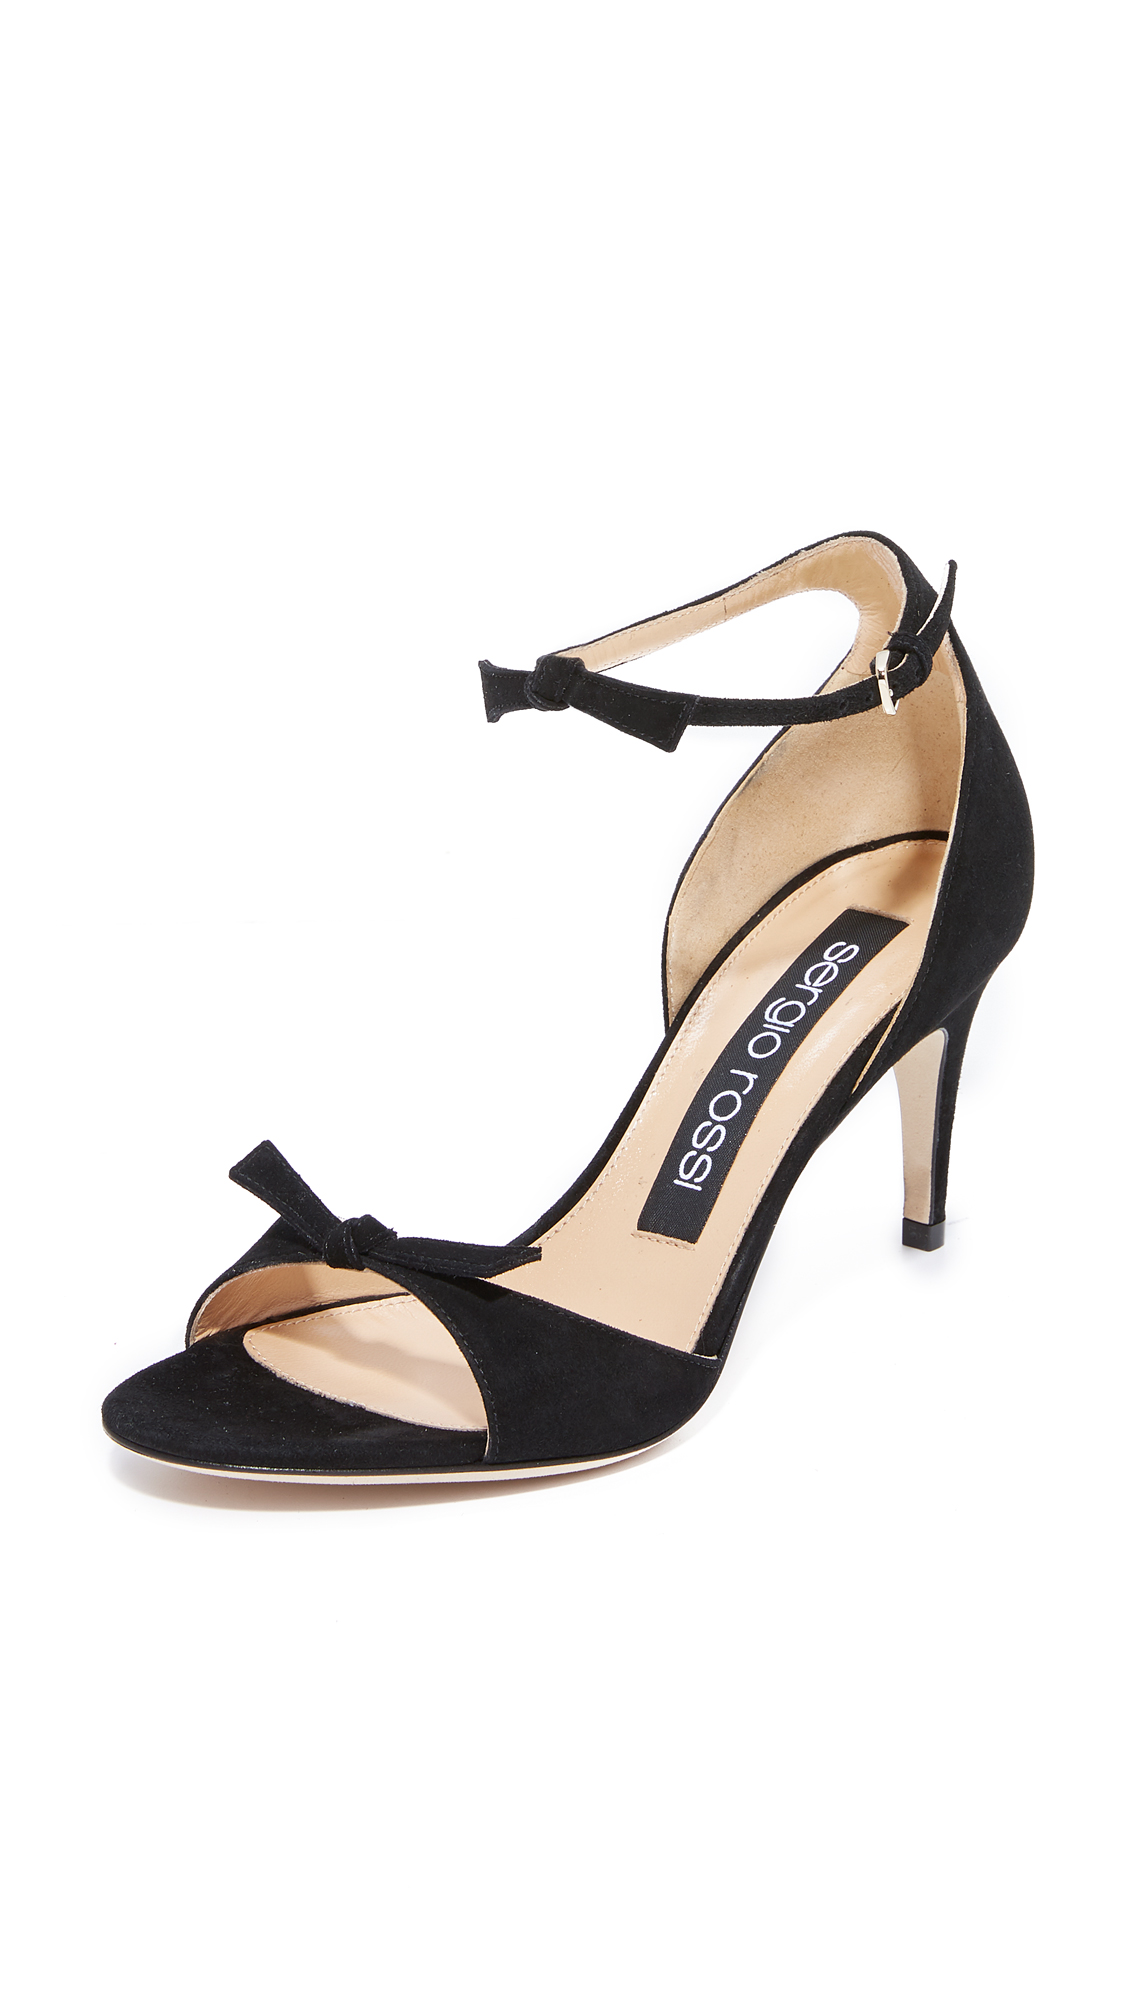 Sergio Rossi Isobel Sandal Heels - Nero